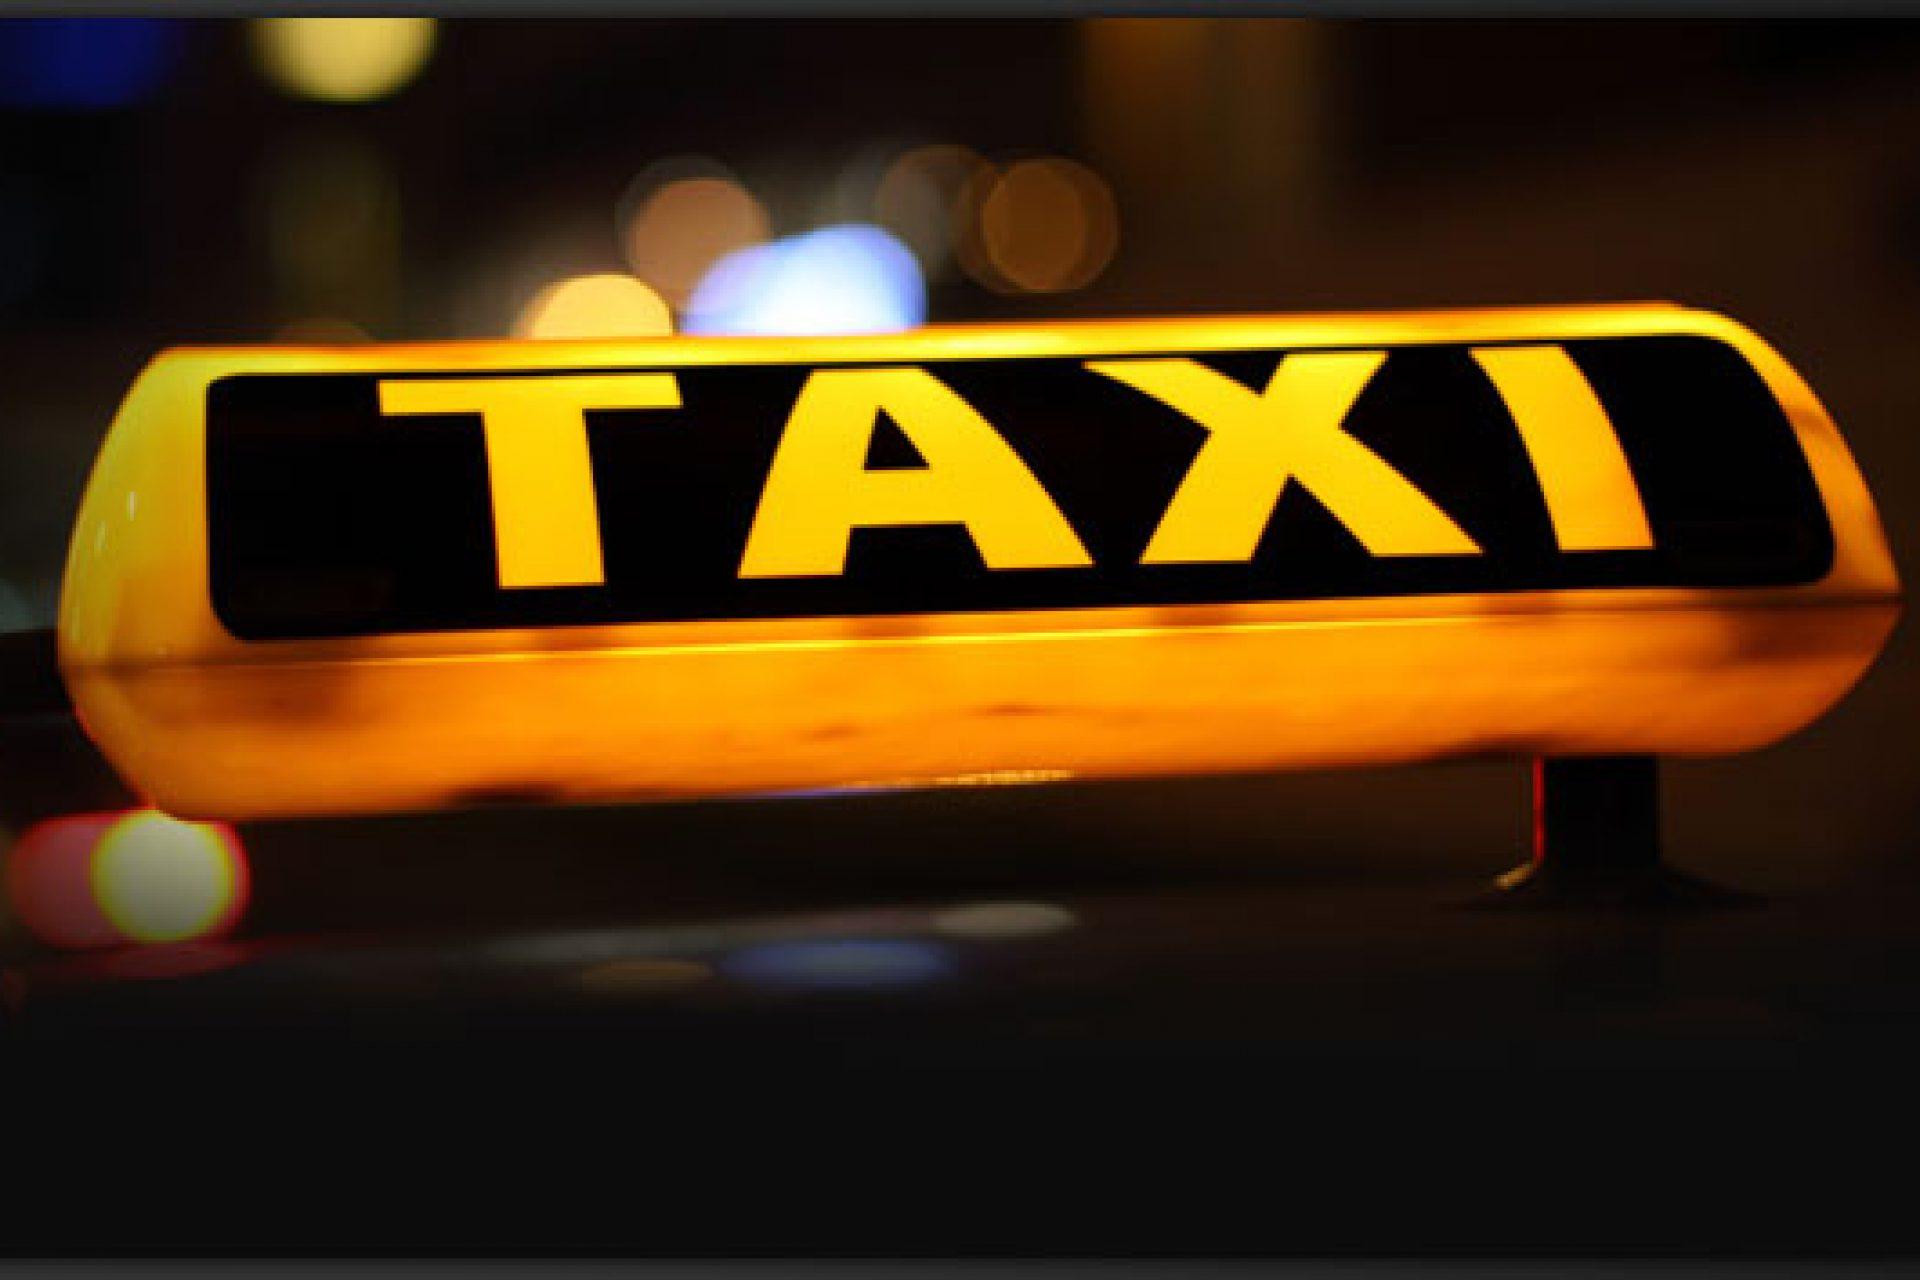 Taxi Service Background Teaneck Taxi NJ Cab 1920x1280